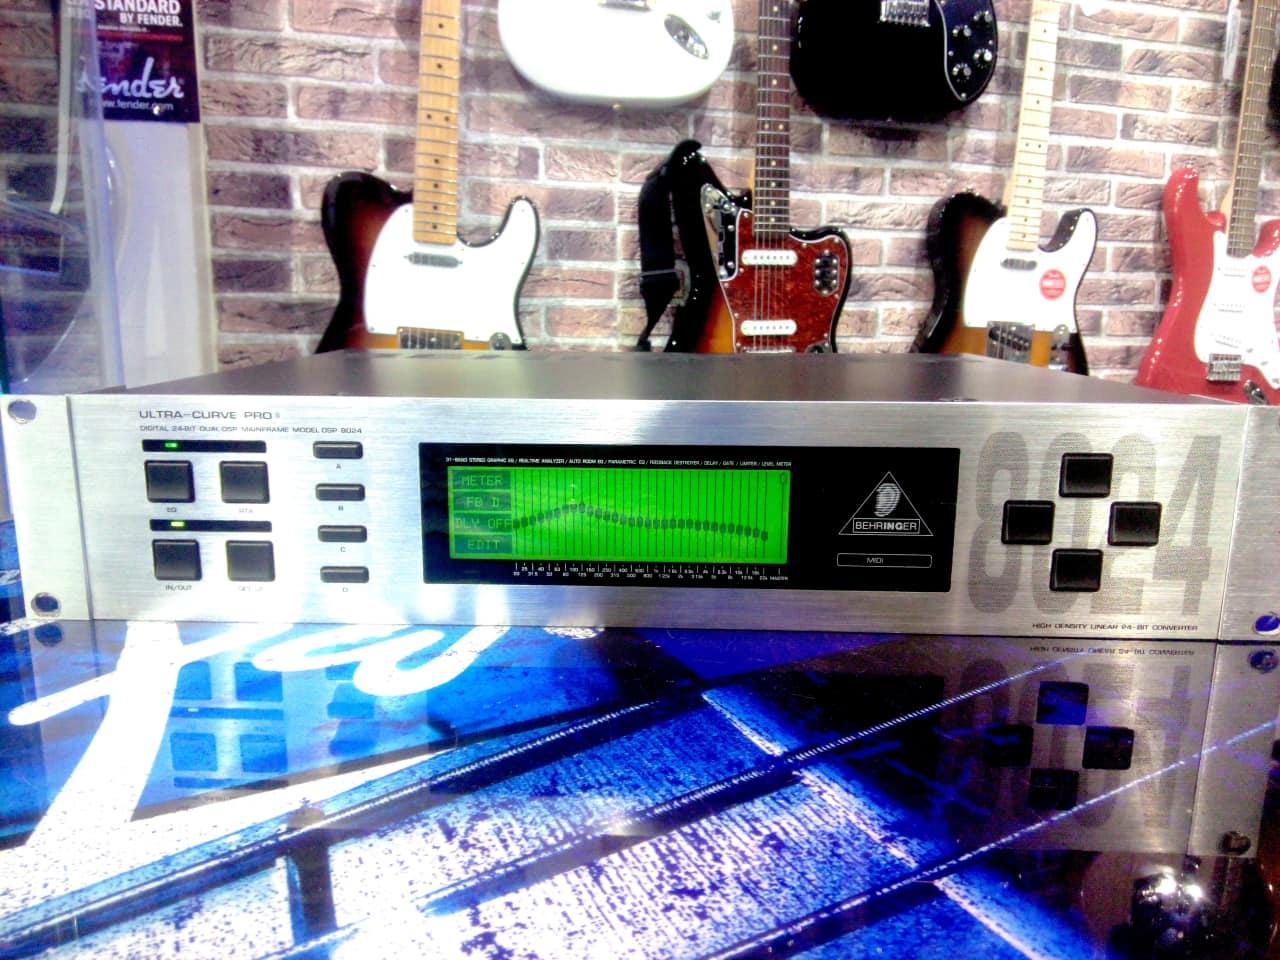 Behringer Ultra-Curve Pro DSP8024   MonoSound   Reverb